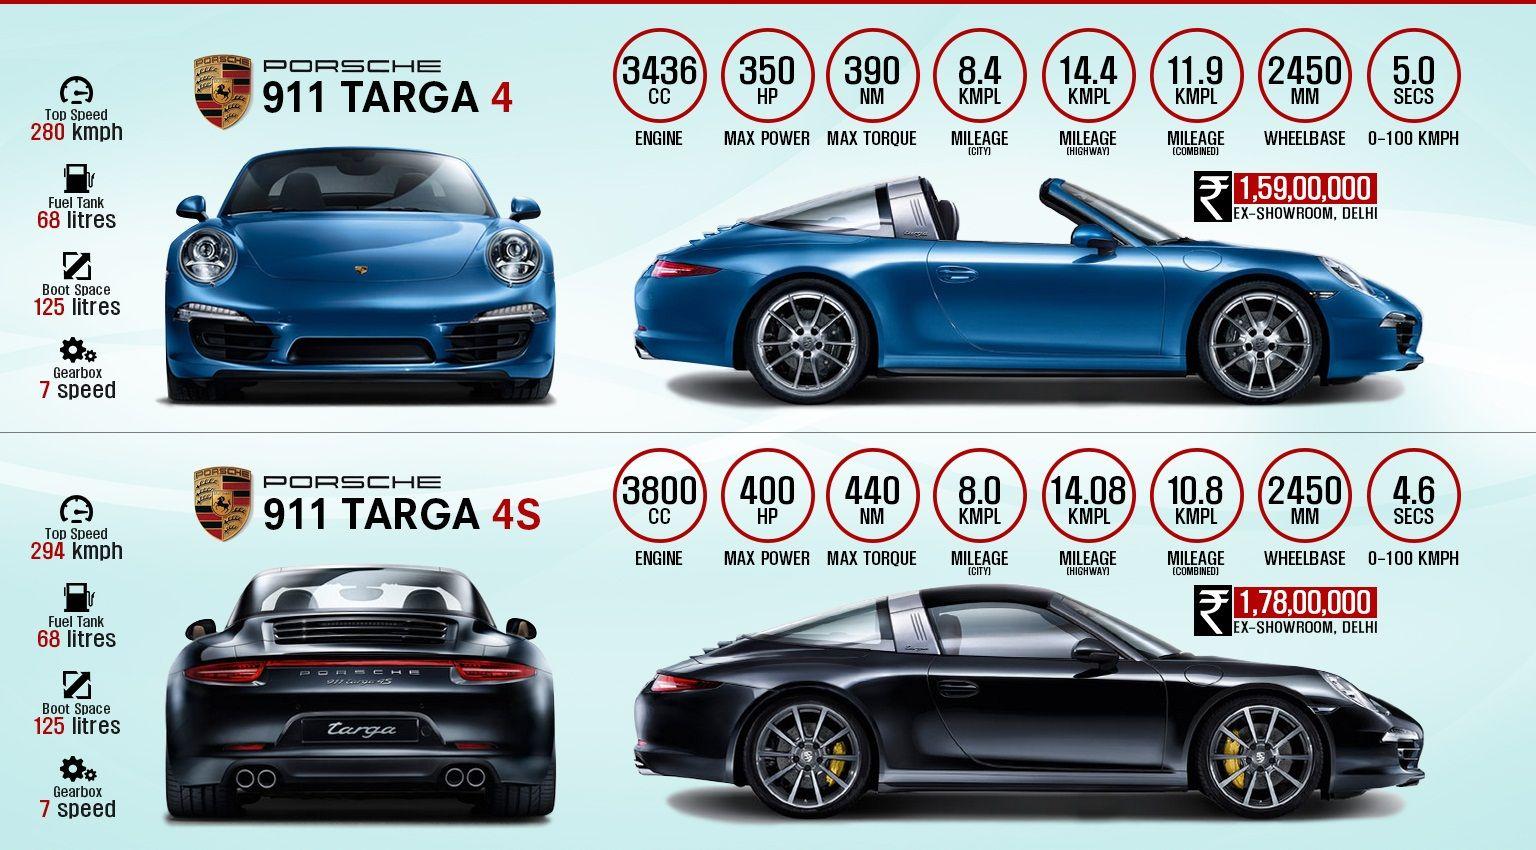 2015 Porsche 911 Targa 4 911 Targa 4s Workshoponwheelz Http Workshoponwheelz Blogspot In 2015 11 2015 Porsche 911 Porsche 911 Targa Porsche 911 Porsche